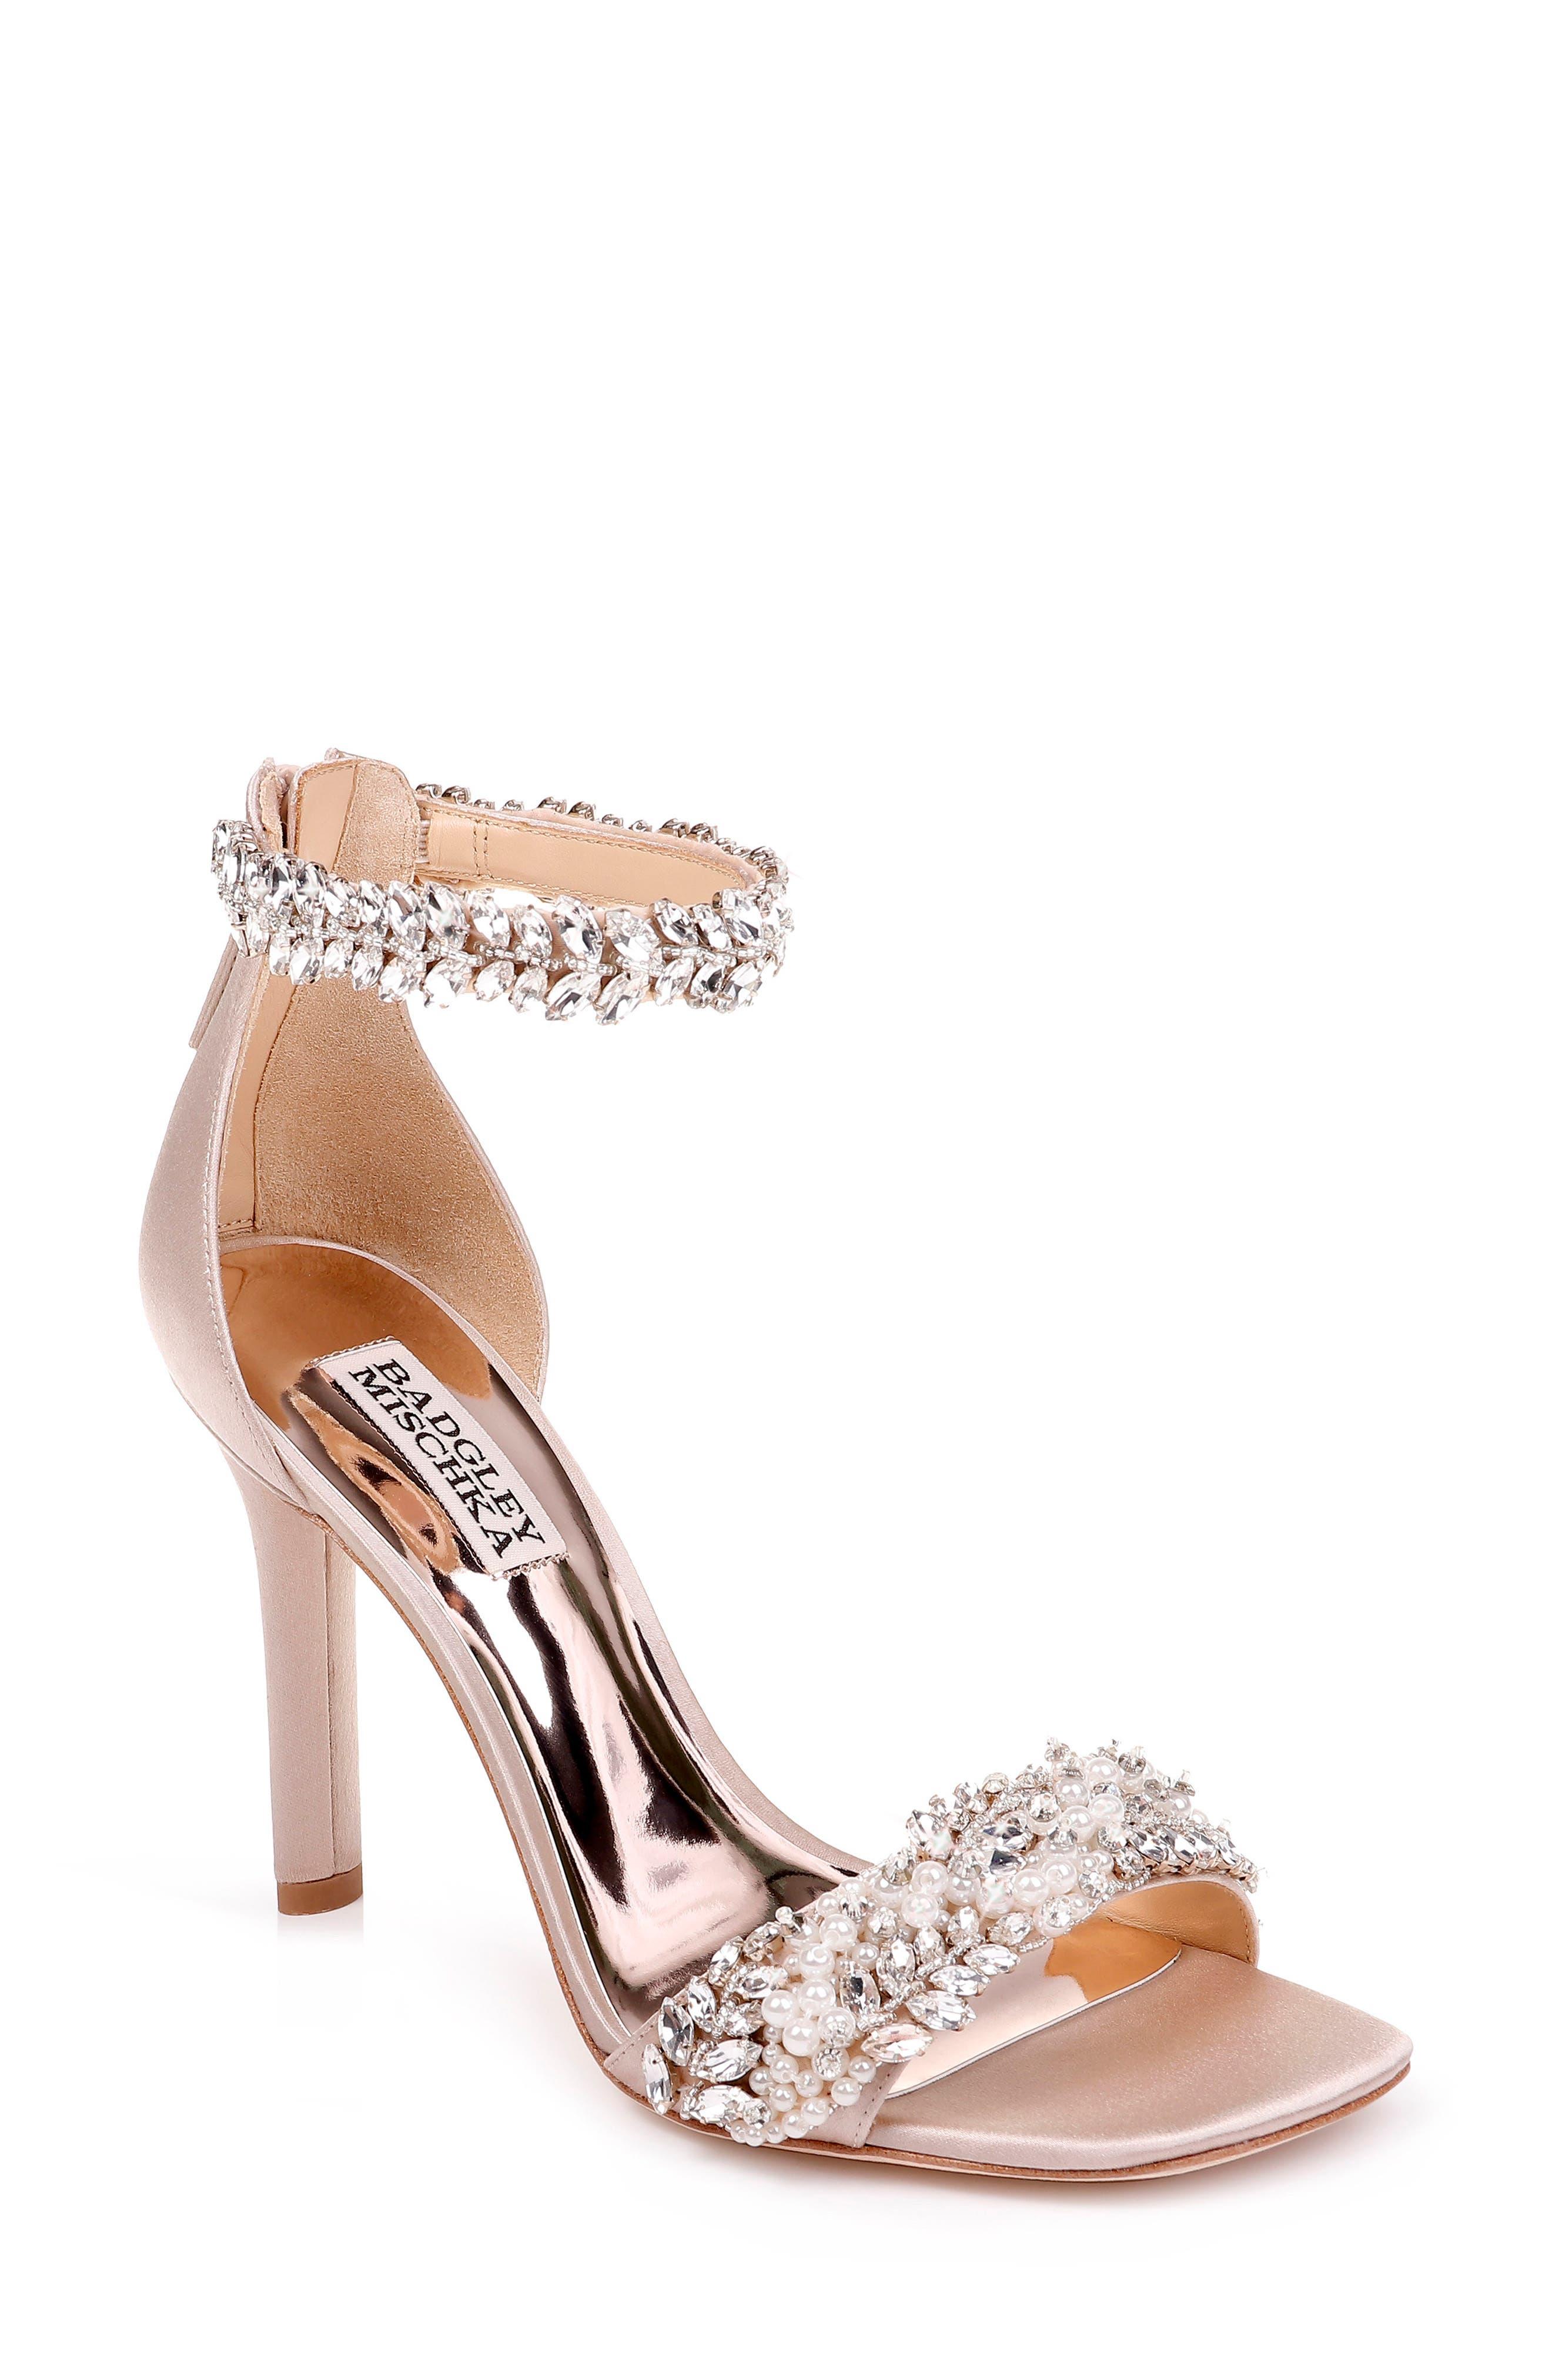 BADGLEY MISCHKA COLLECTION, Badgley Mischka Fiorenza Crystal & Imitation Pearl Embellished Sandal, Main thumbnail 1, color, BEIGE SATIN